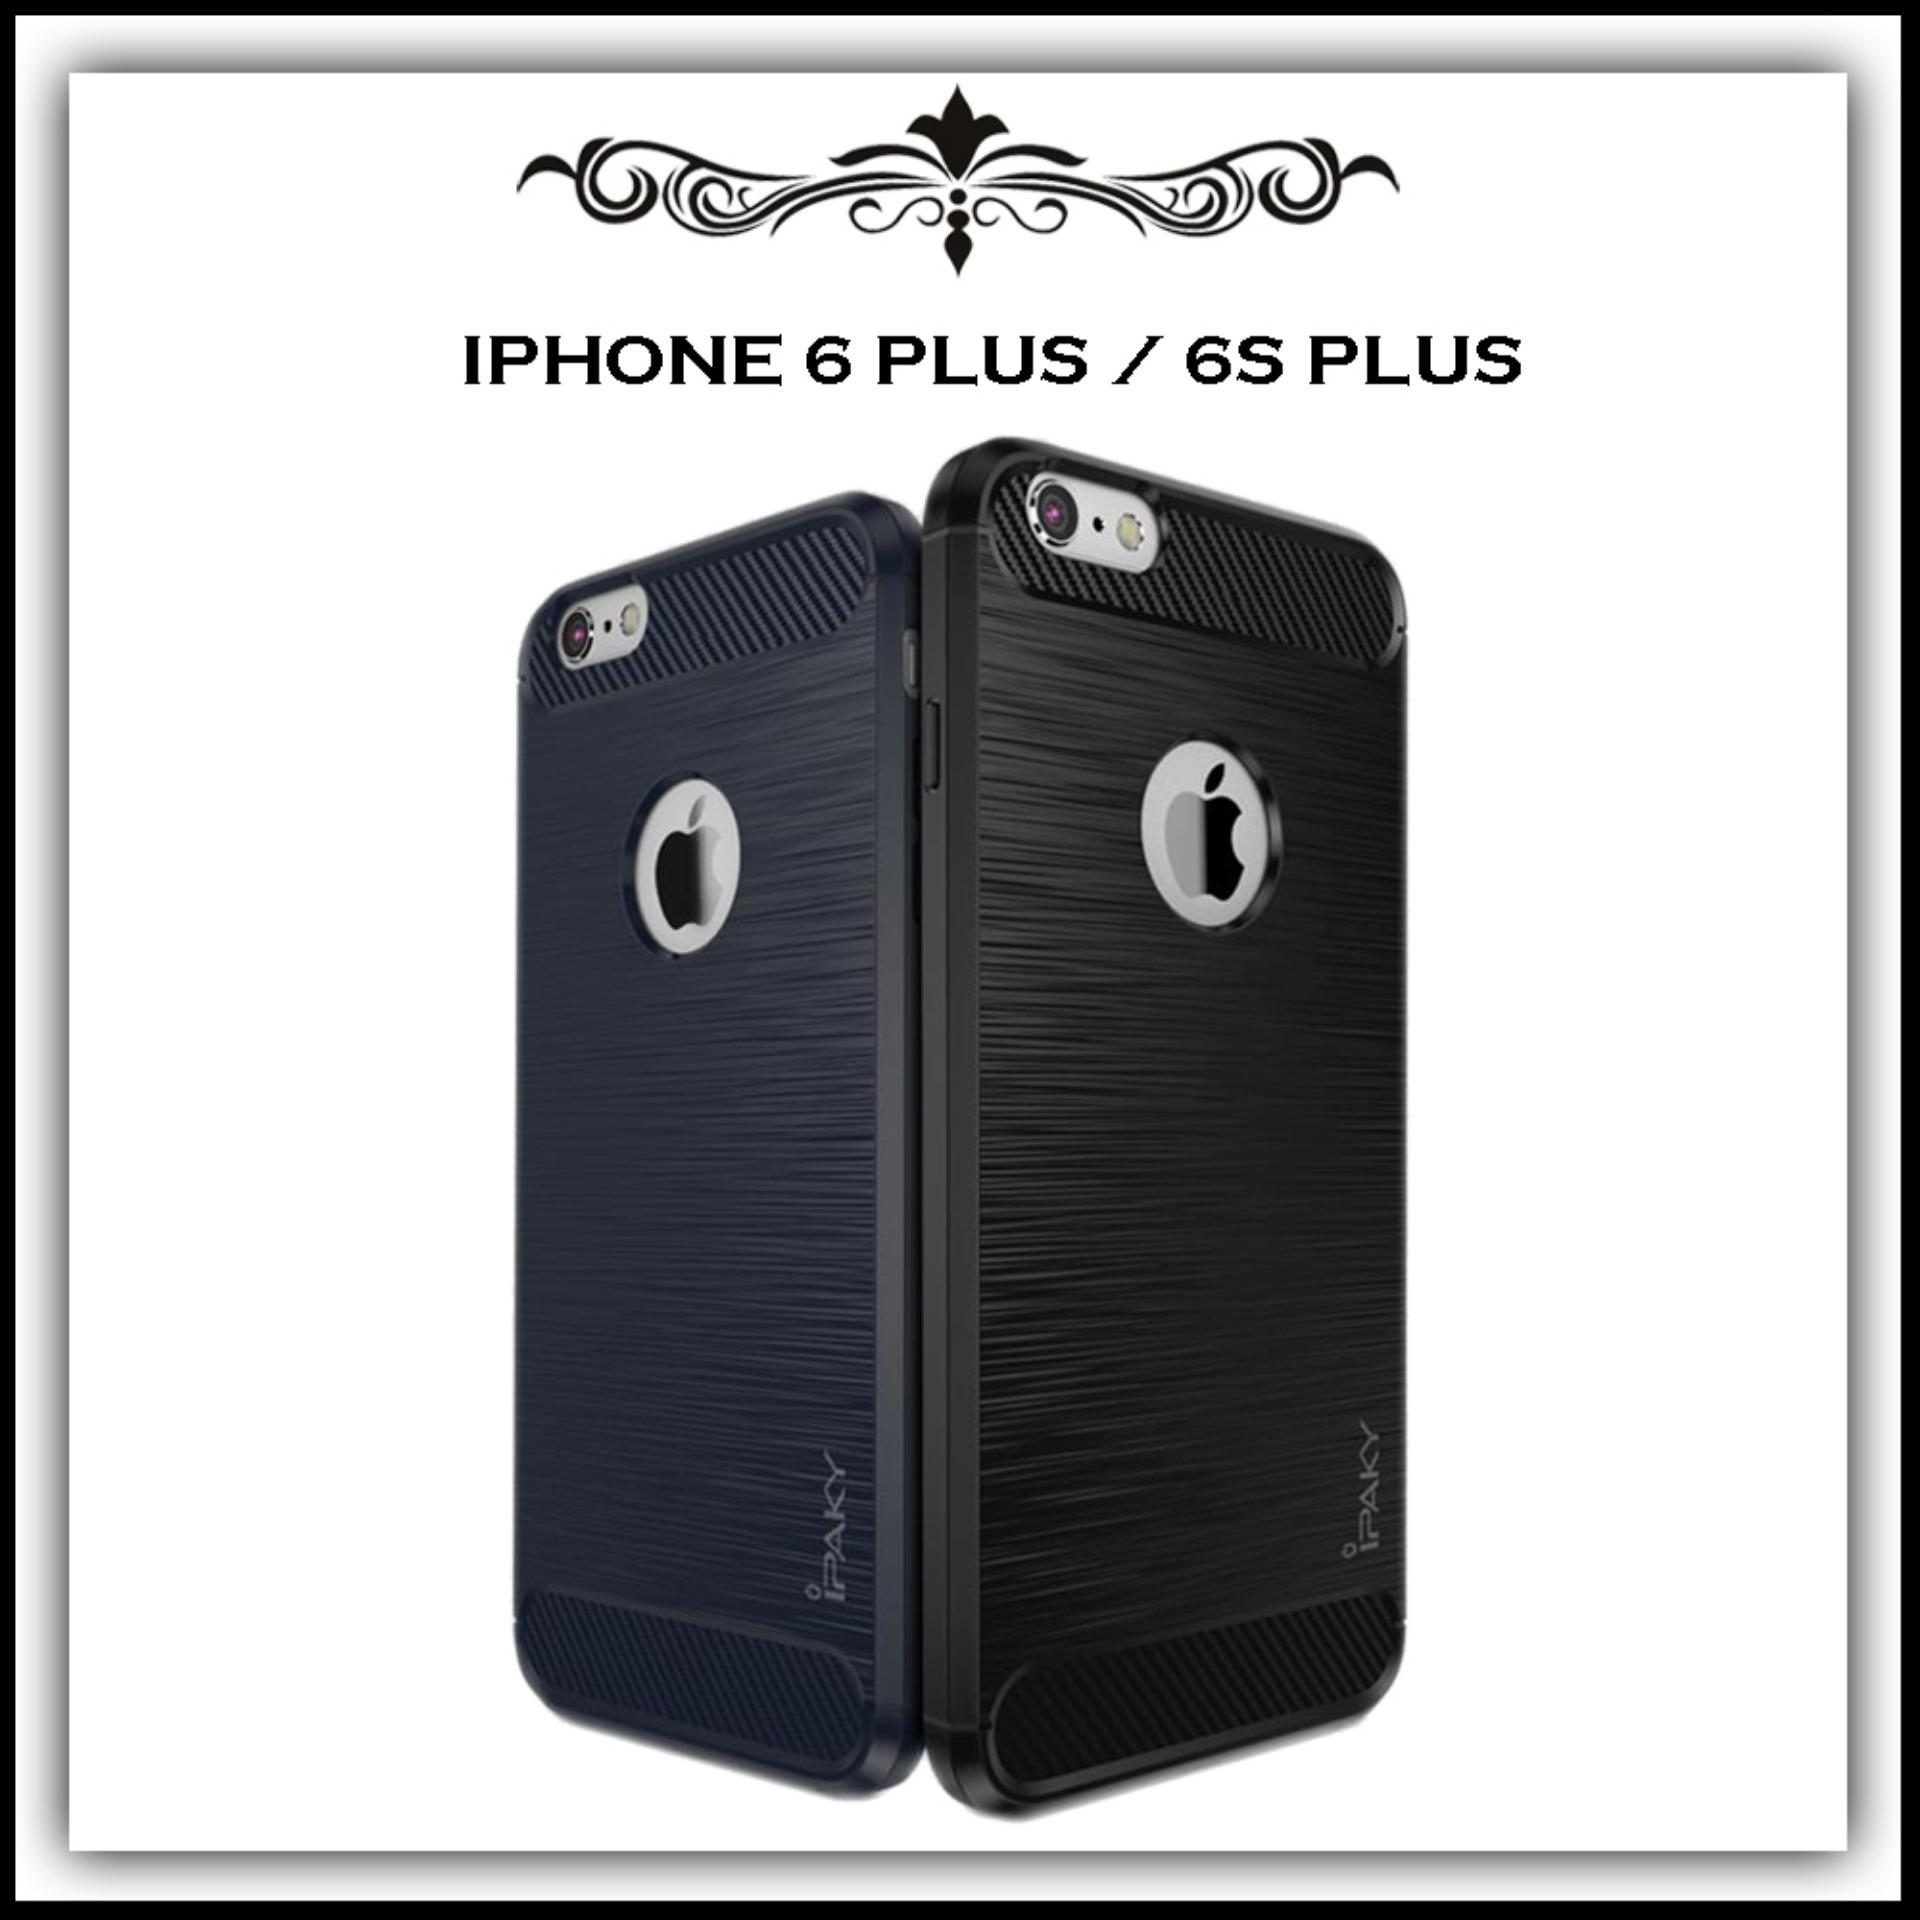 Mushroom Case Ipaky Carbon Fiber Shockproof Hybrid Elegant Case for Iphone 6 Plus / 6s Plus